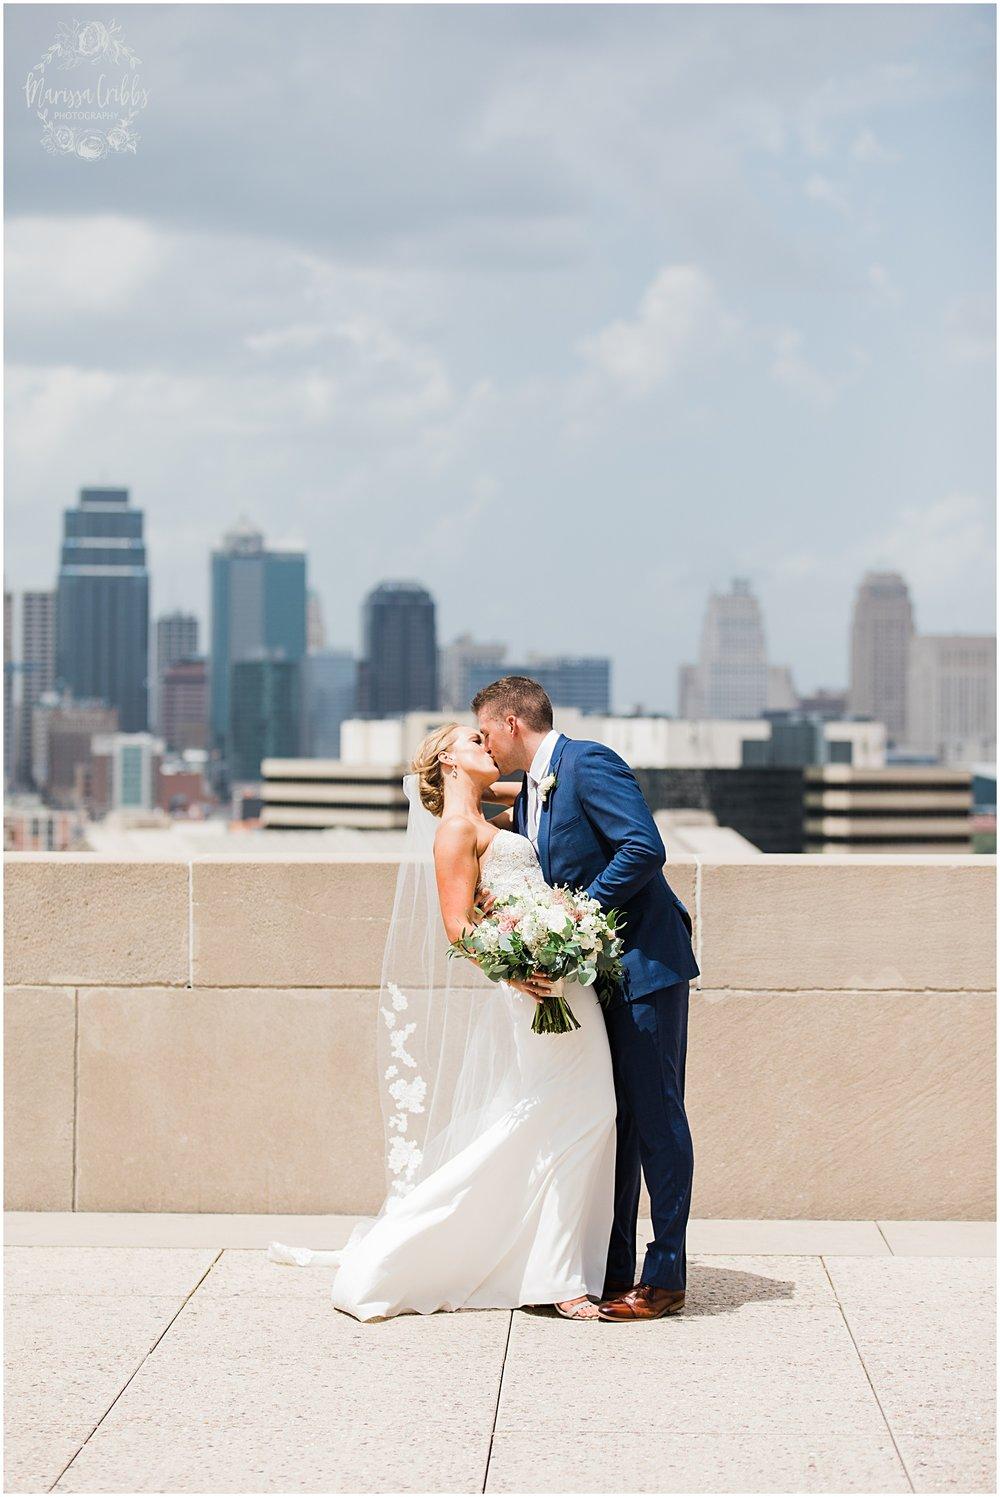 MAGNOLIA VENUE WEDDING | CHARLIE & NATALIE | MARISSA CRIBBS PHOTOGRAPHY_5725.jpg